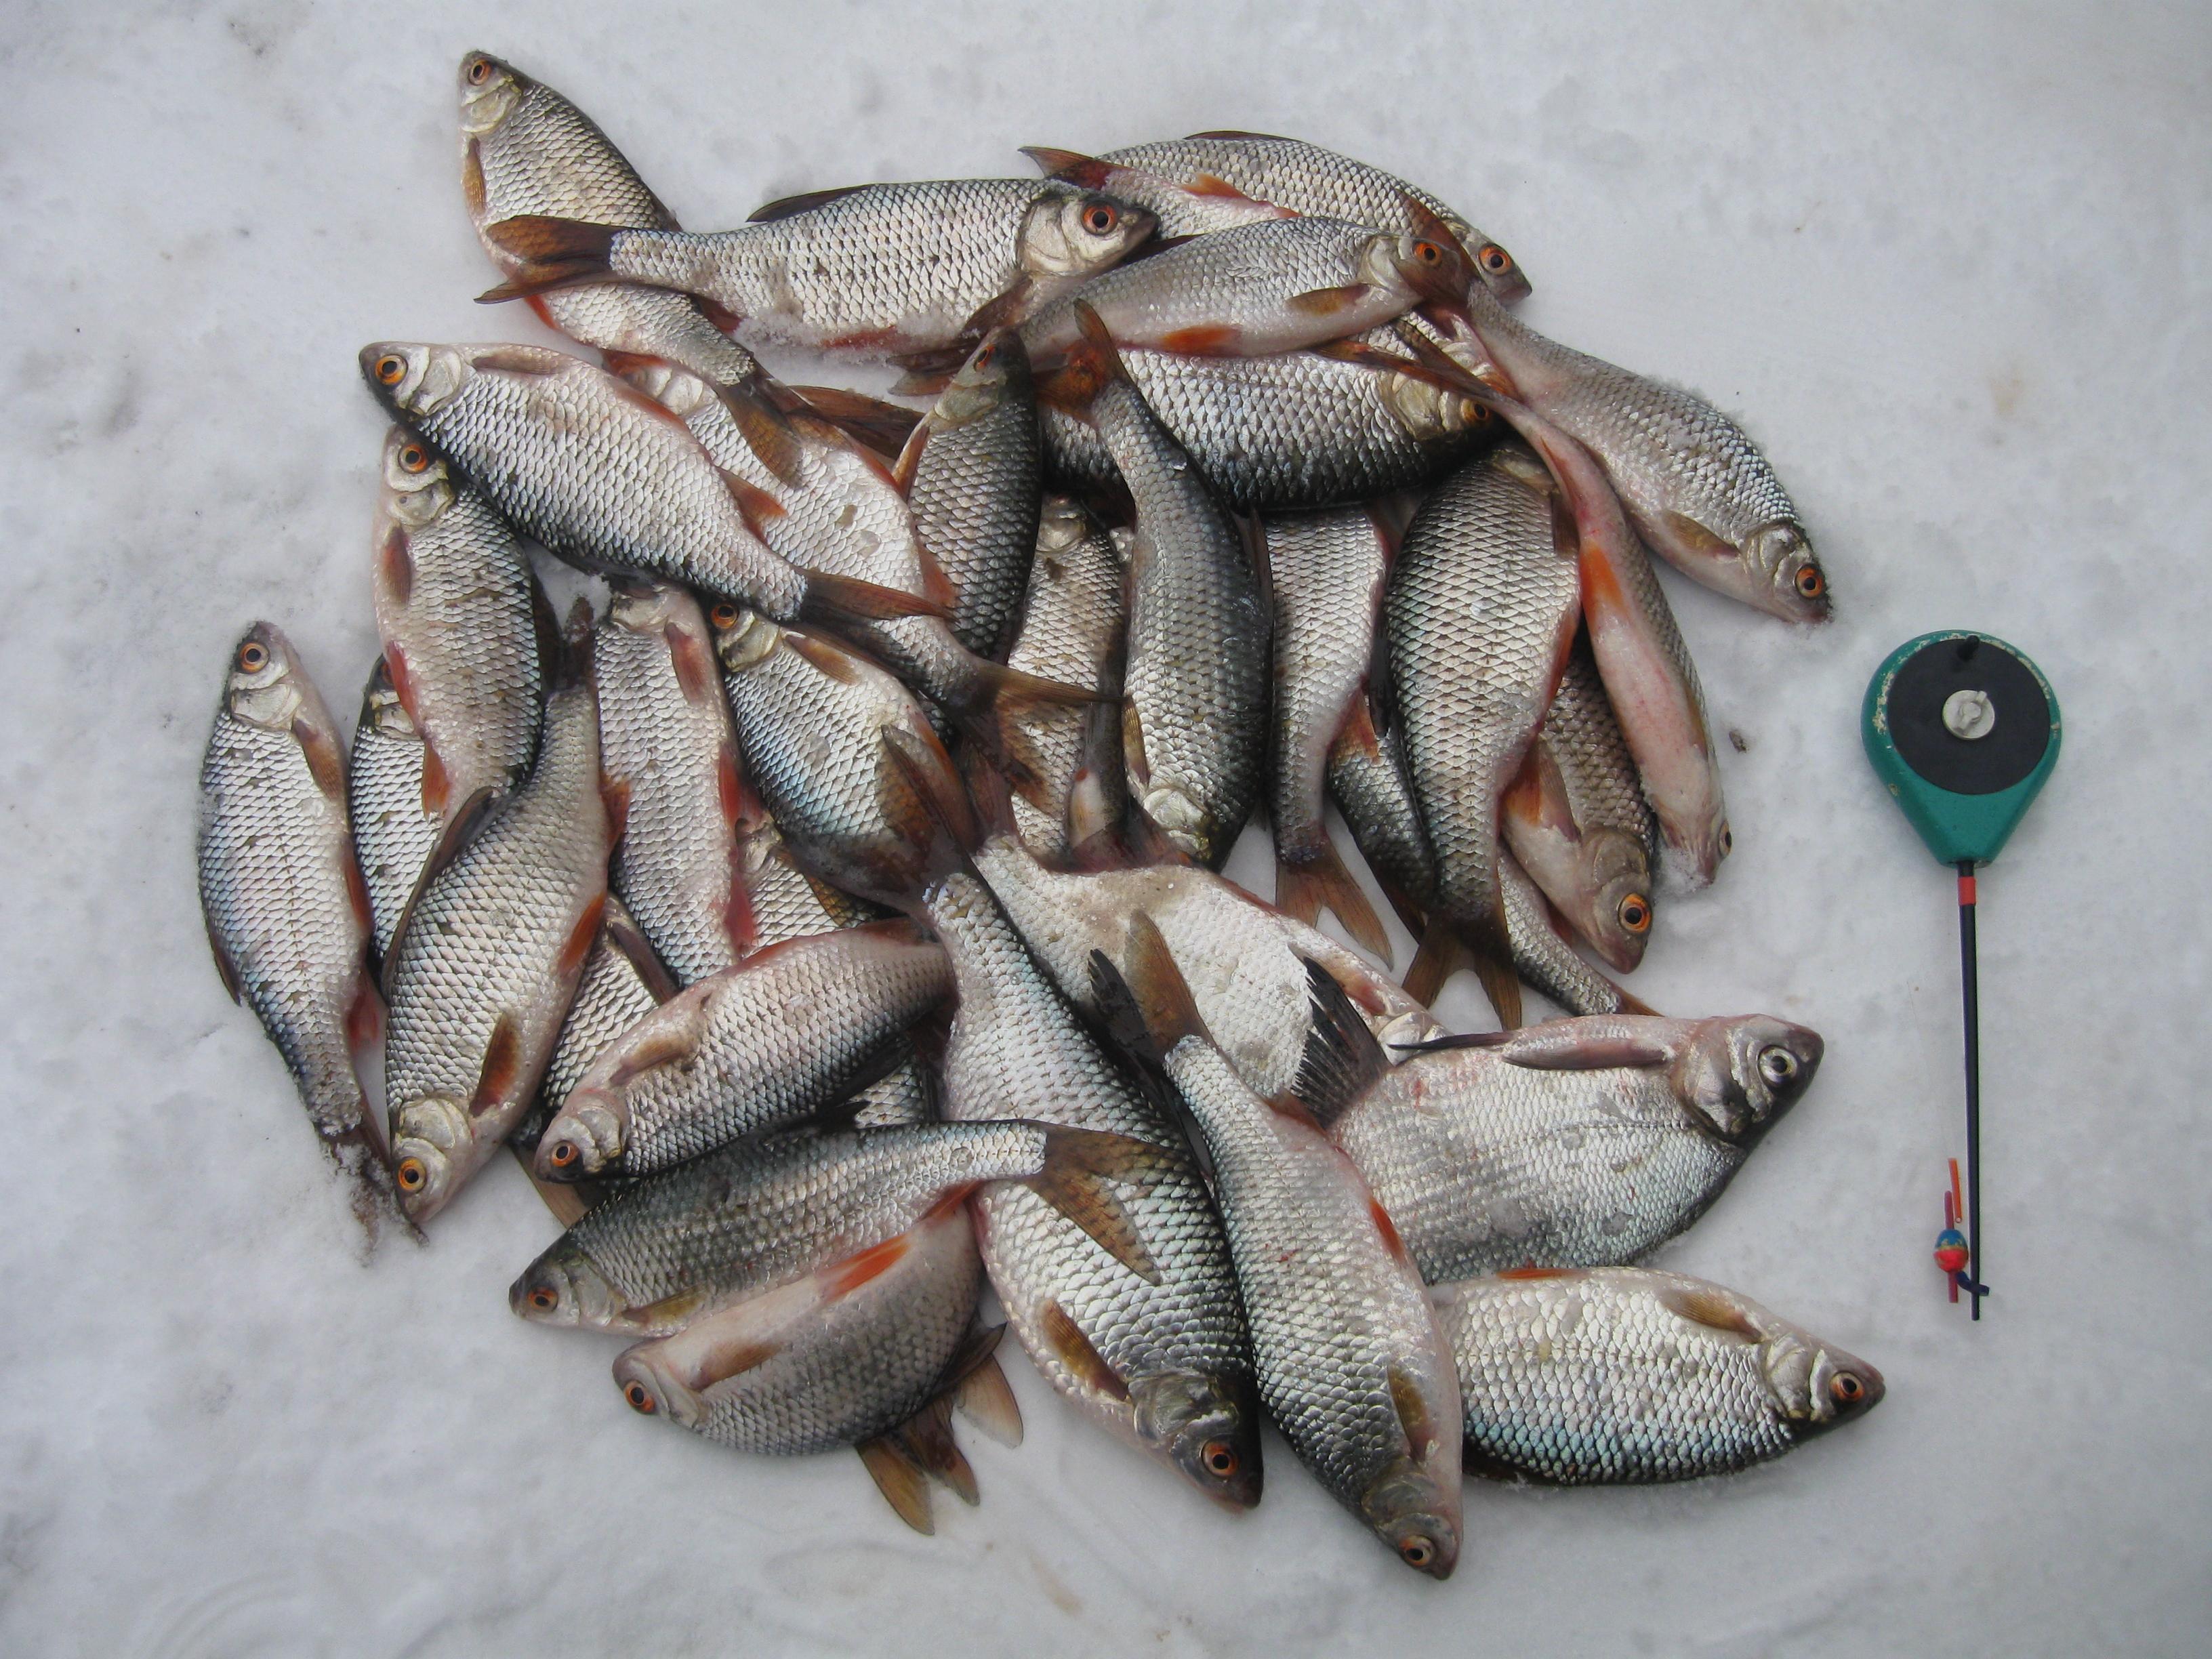 как клюет рыба все о рыбалке